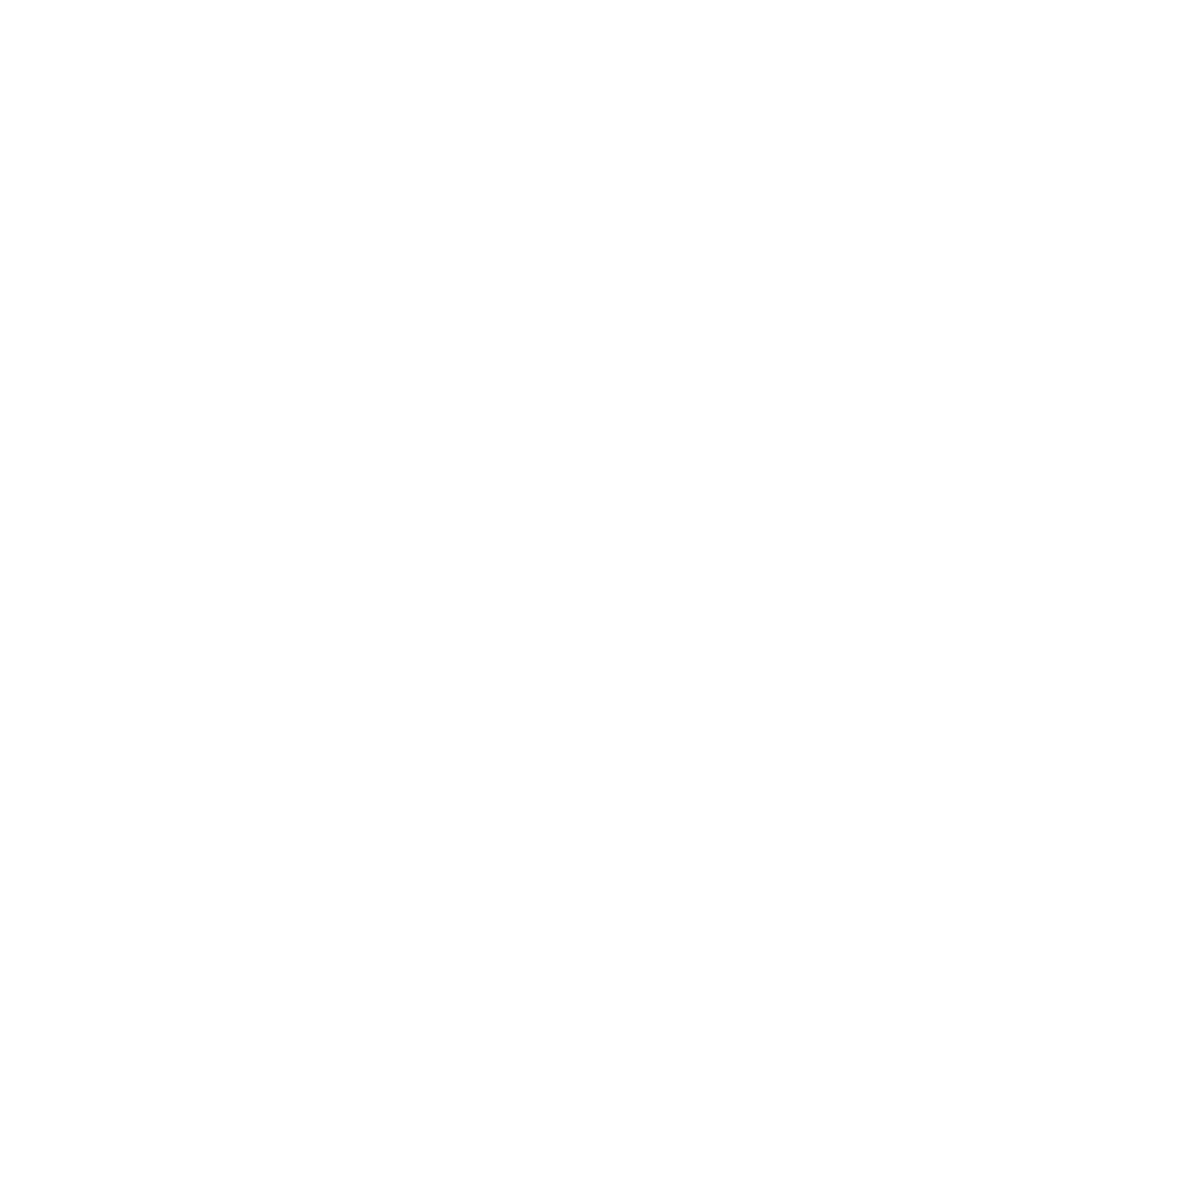 Prisma Clear Ice | Hielo cristalino premium | Buenos Aires